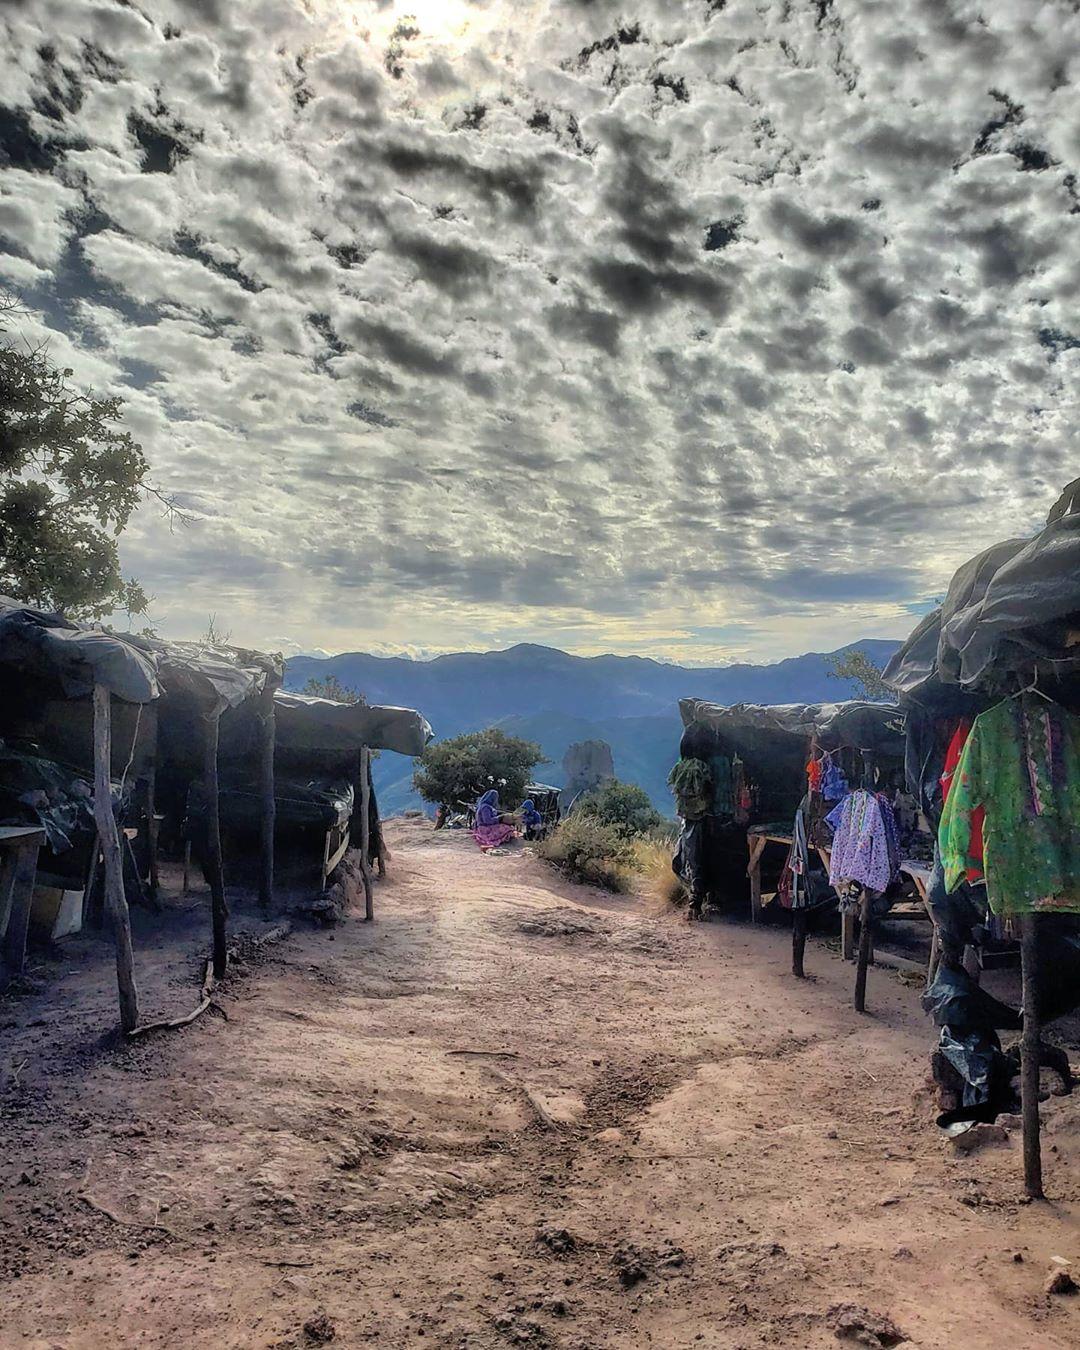 Barrancas del Cobre - Sierra Tarahumara